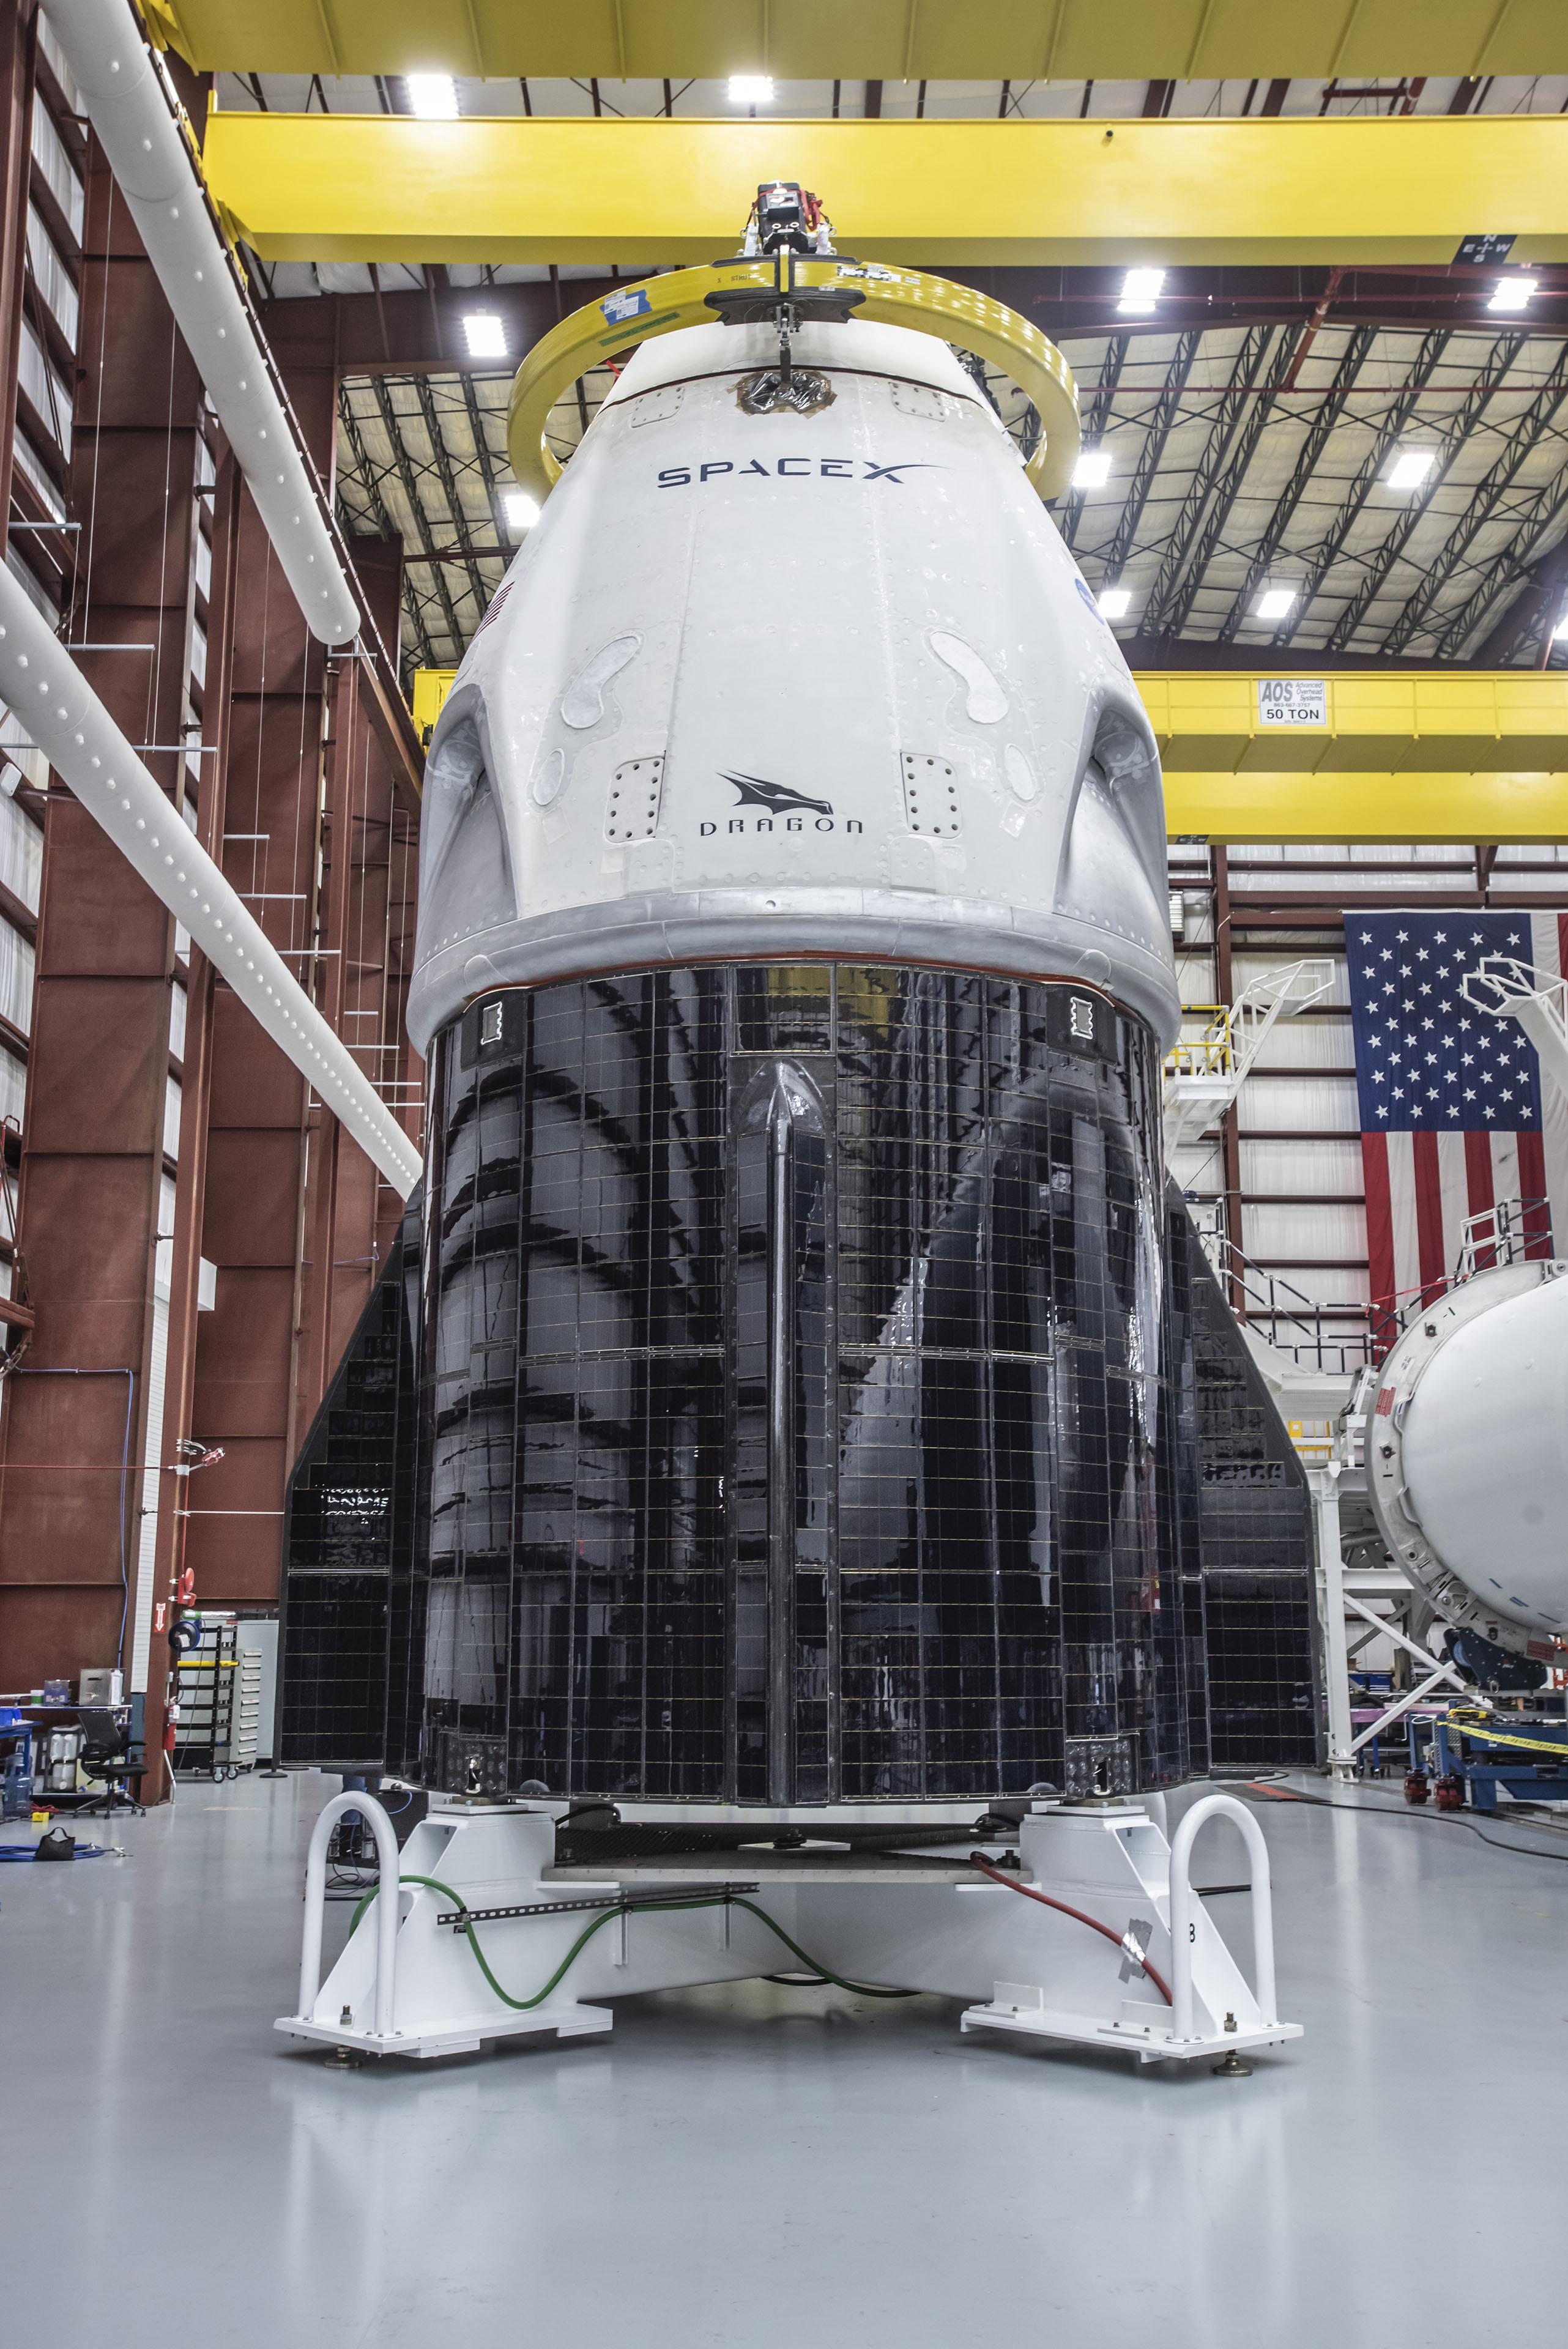 DRAGON. Истолчник фото: https://ru.m.wikipedia.org/wiki/%D0%A4%D0%B0%D0%B9%D0%BB:NASA_Crew_Demo-1_(31433487287).jpg